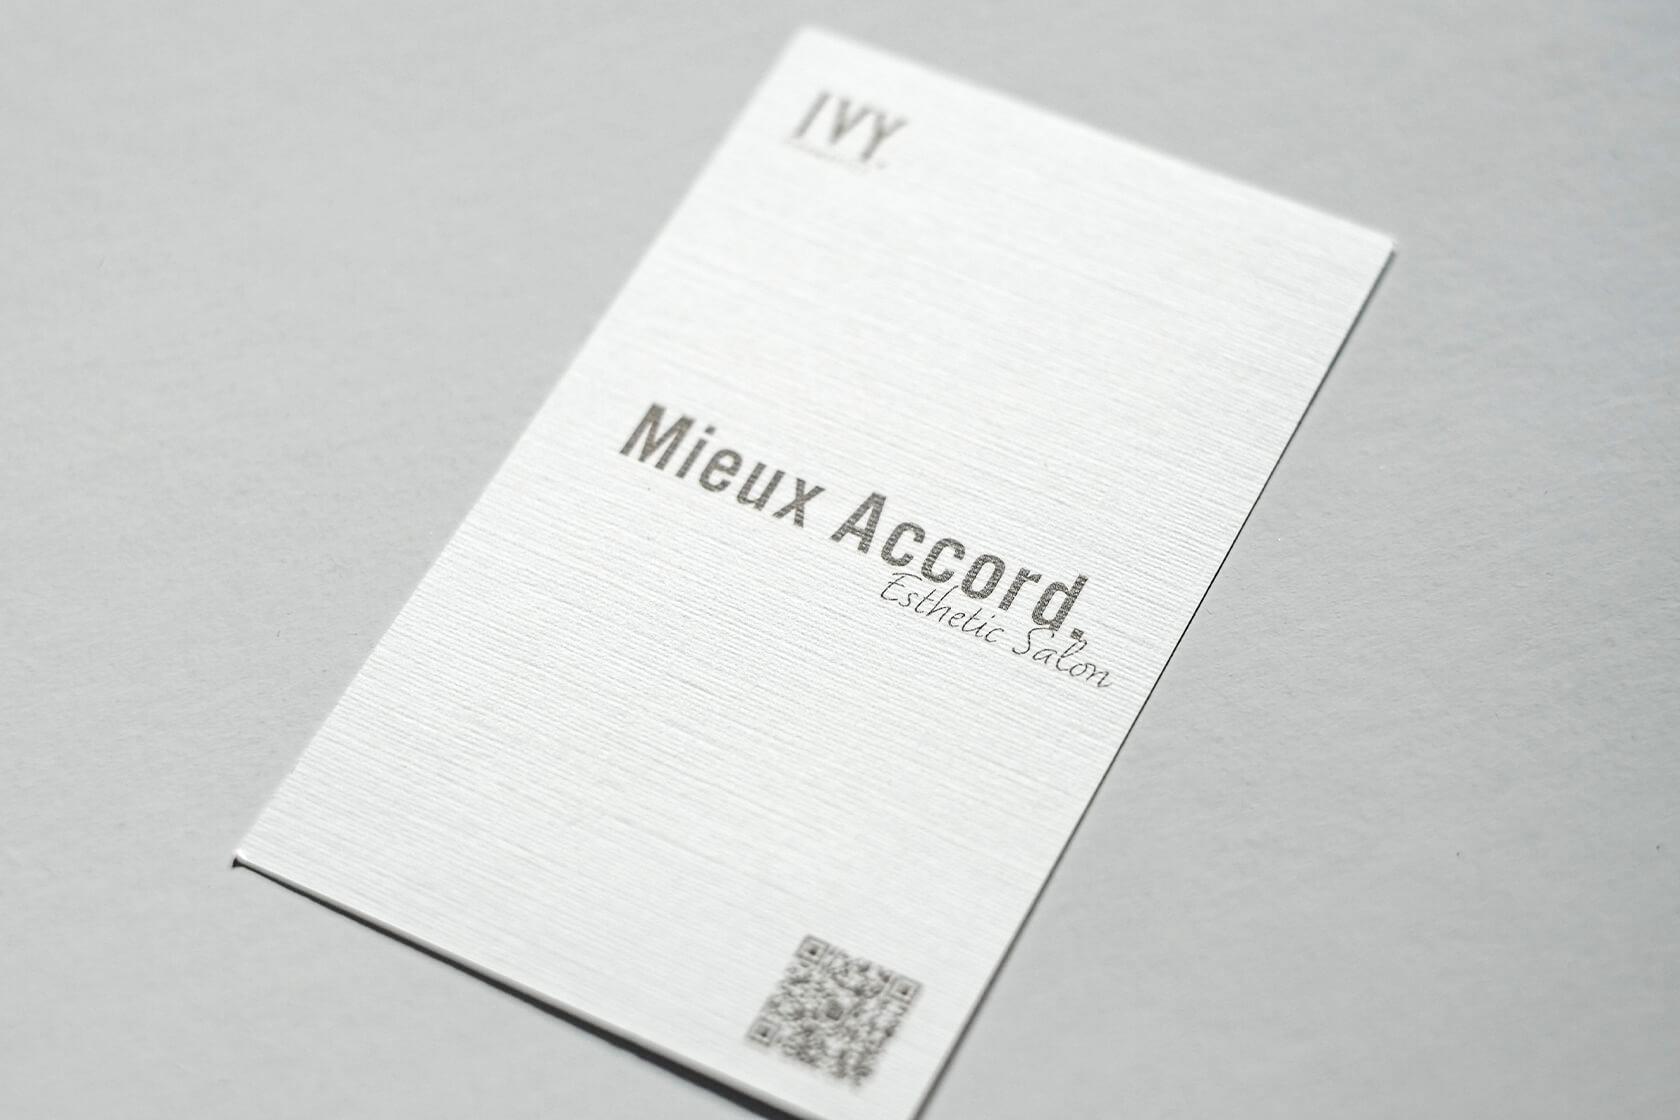 Mieux Accord Esthetic Salon / ロゴタイプ・名刺制作